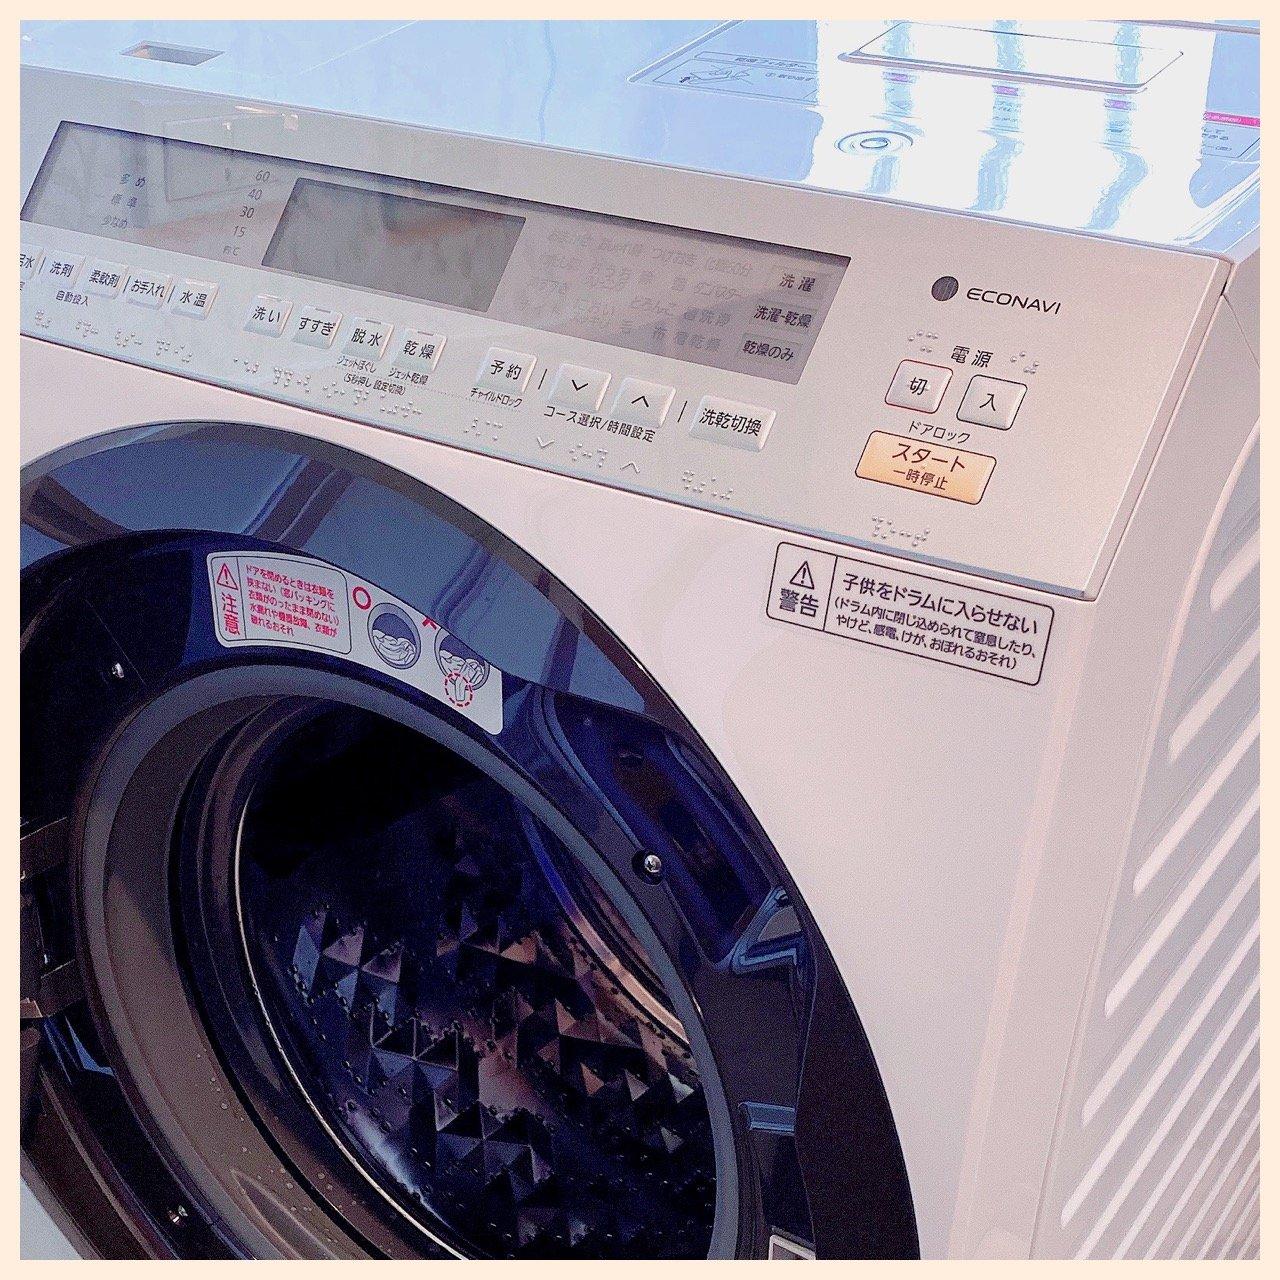 Panasonic ななめドラム洗濯乾燥機 NA-VX8900L-W / 古い洗濯機の回収や配送代や5年保証など込みで家電量販店にて21万円で購入(ポイント的なものは全部で1万円ぐらいついた)。現時点では、Amazonマケプレで218900円、価格com最安価格196666円。 https://t.co/0U5PbFD6L8